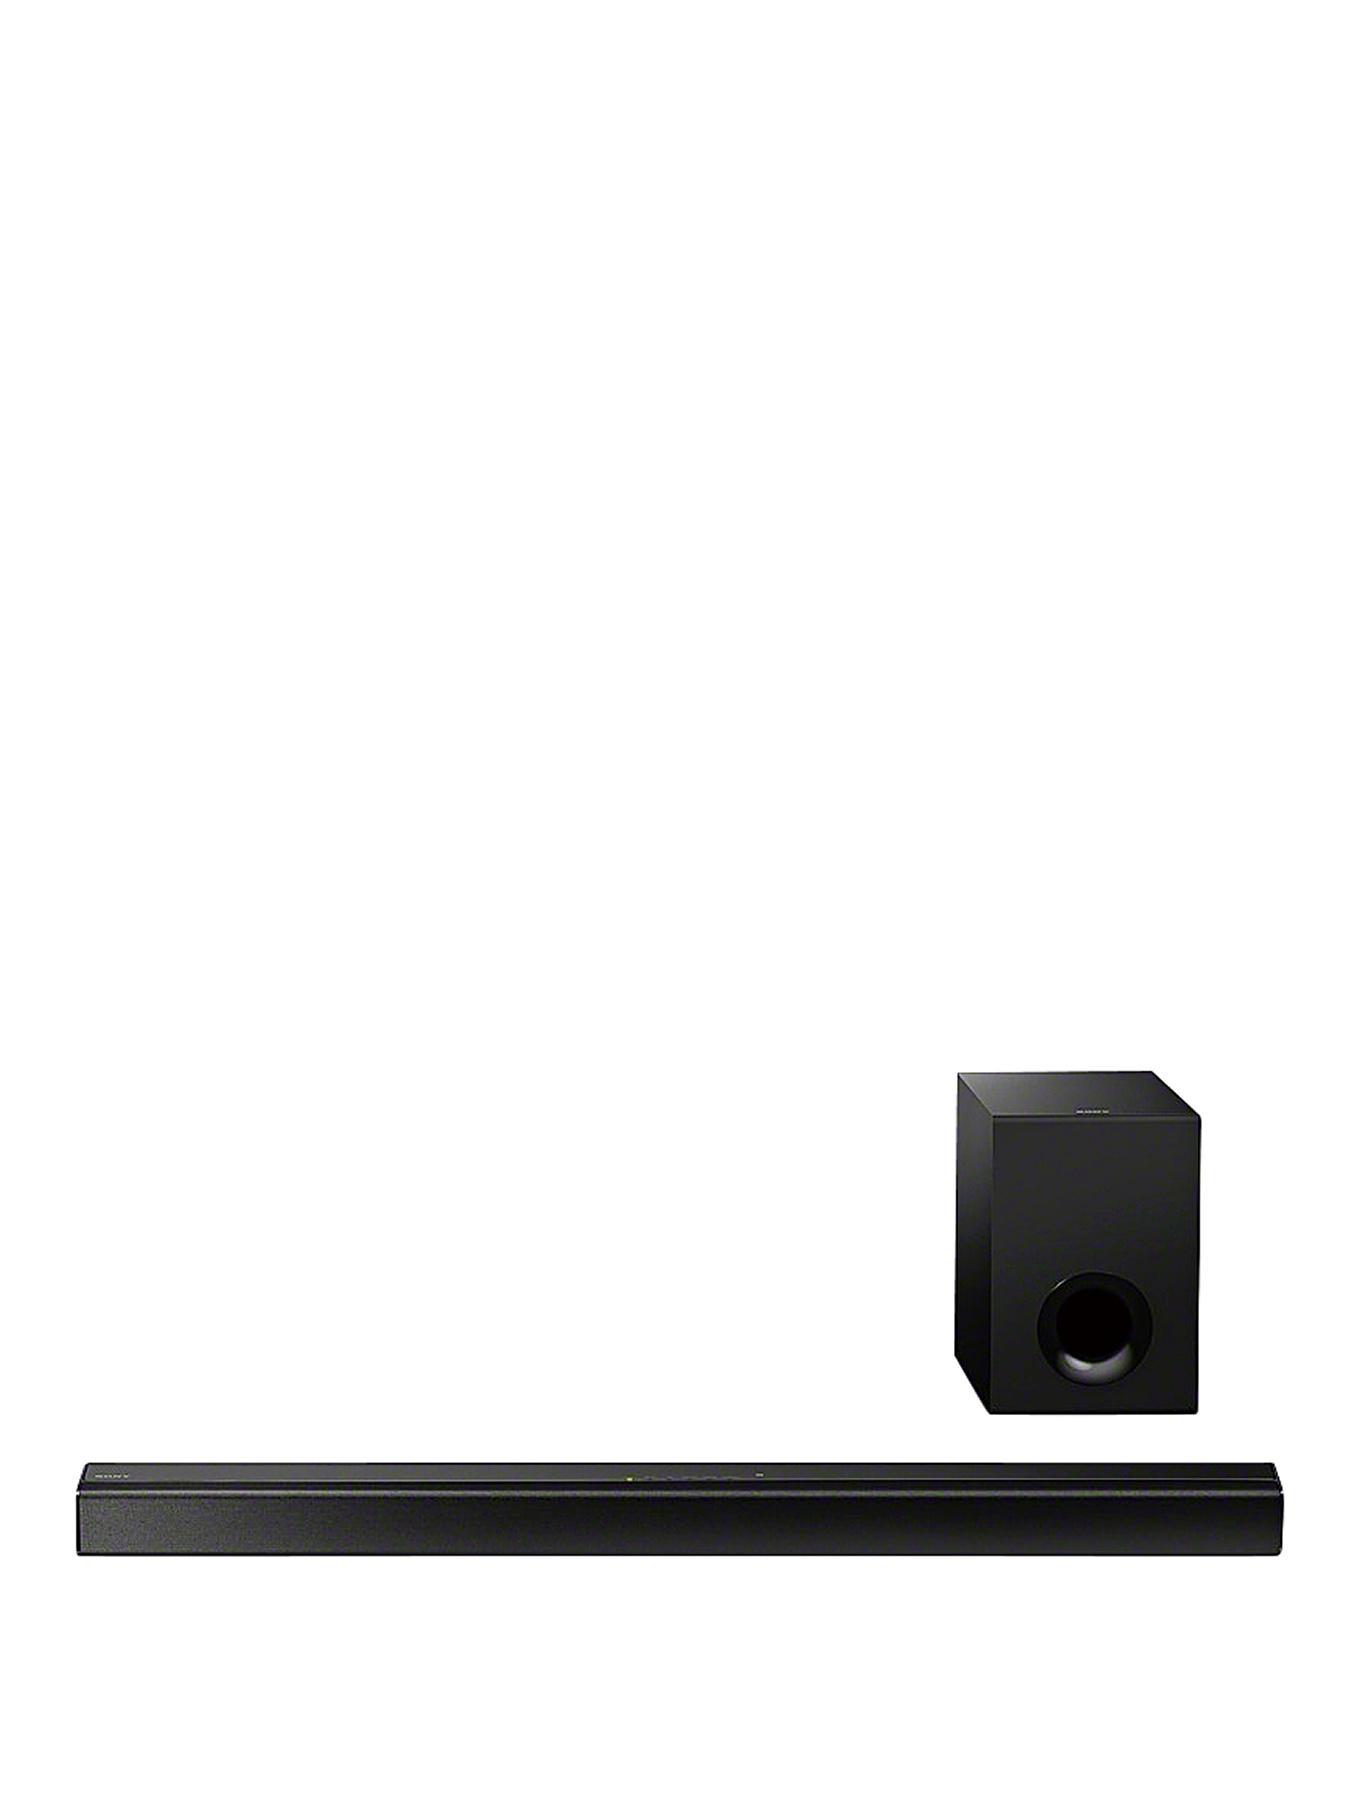 Sony CT80 80W Bluetooth Soundbar With Subwoofer